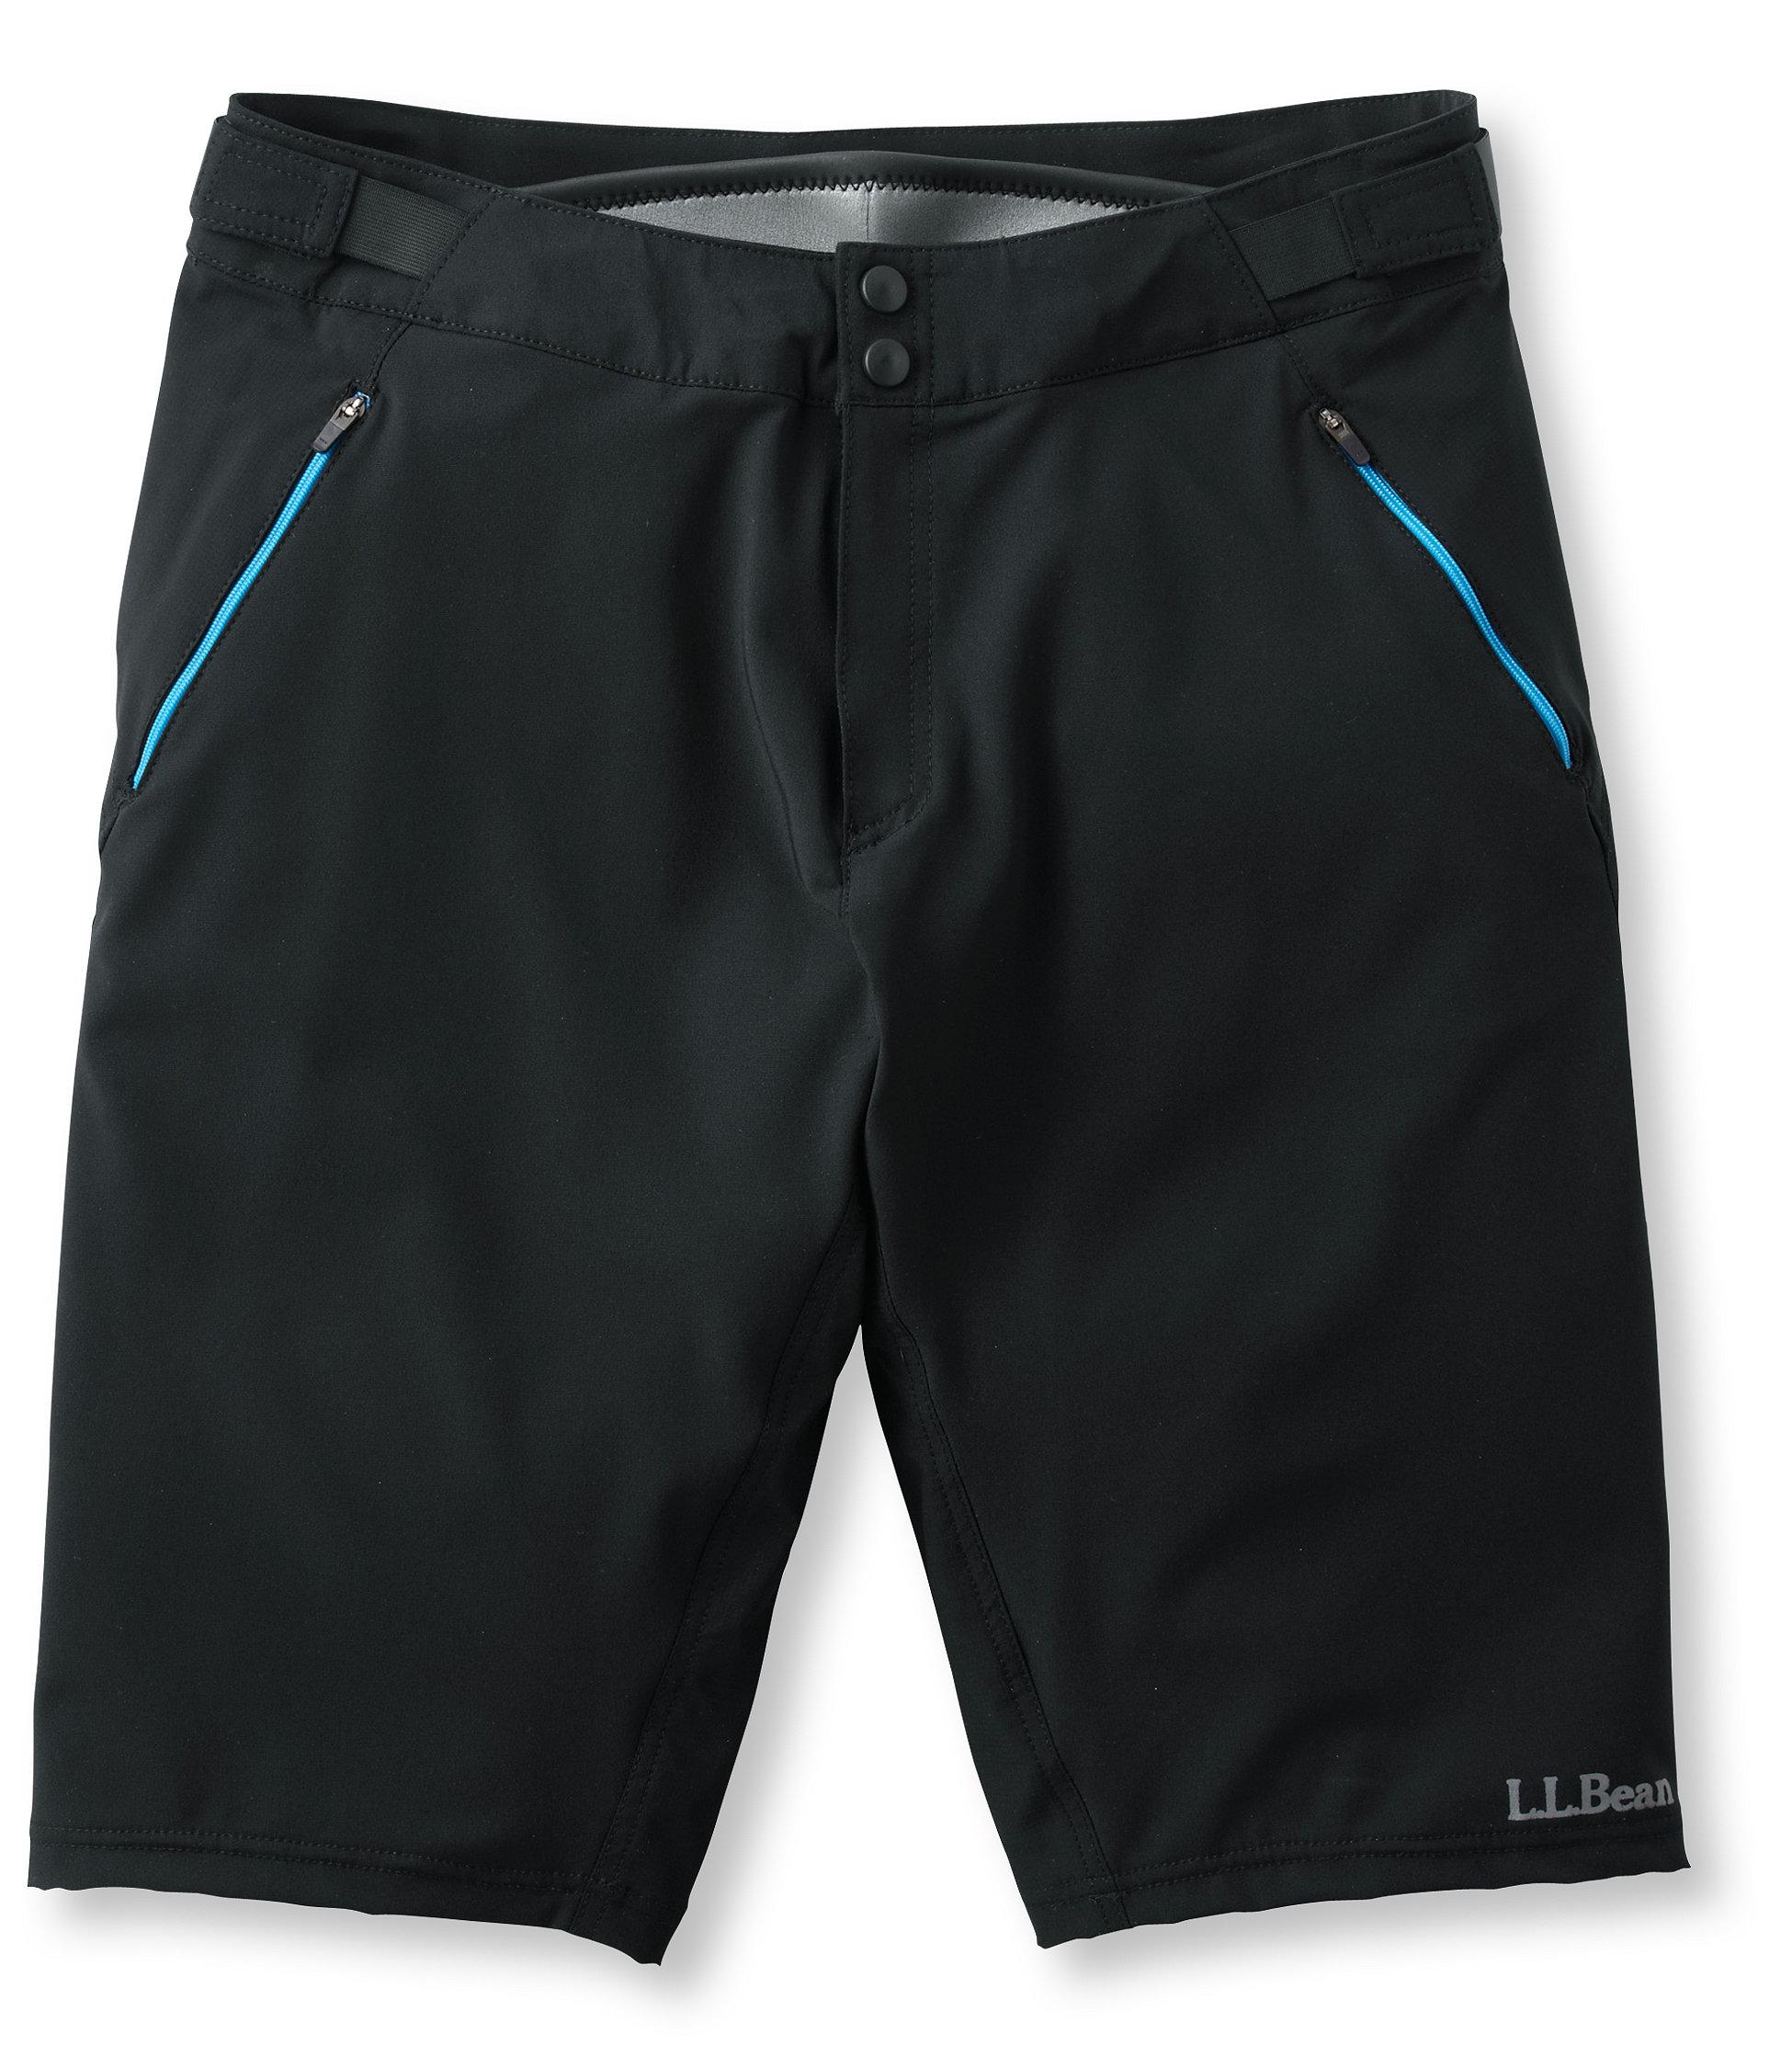 L.L.Bean Superstretch Paddlers Shorts